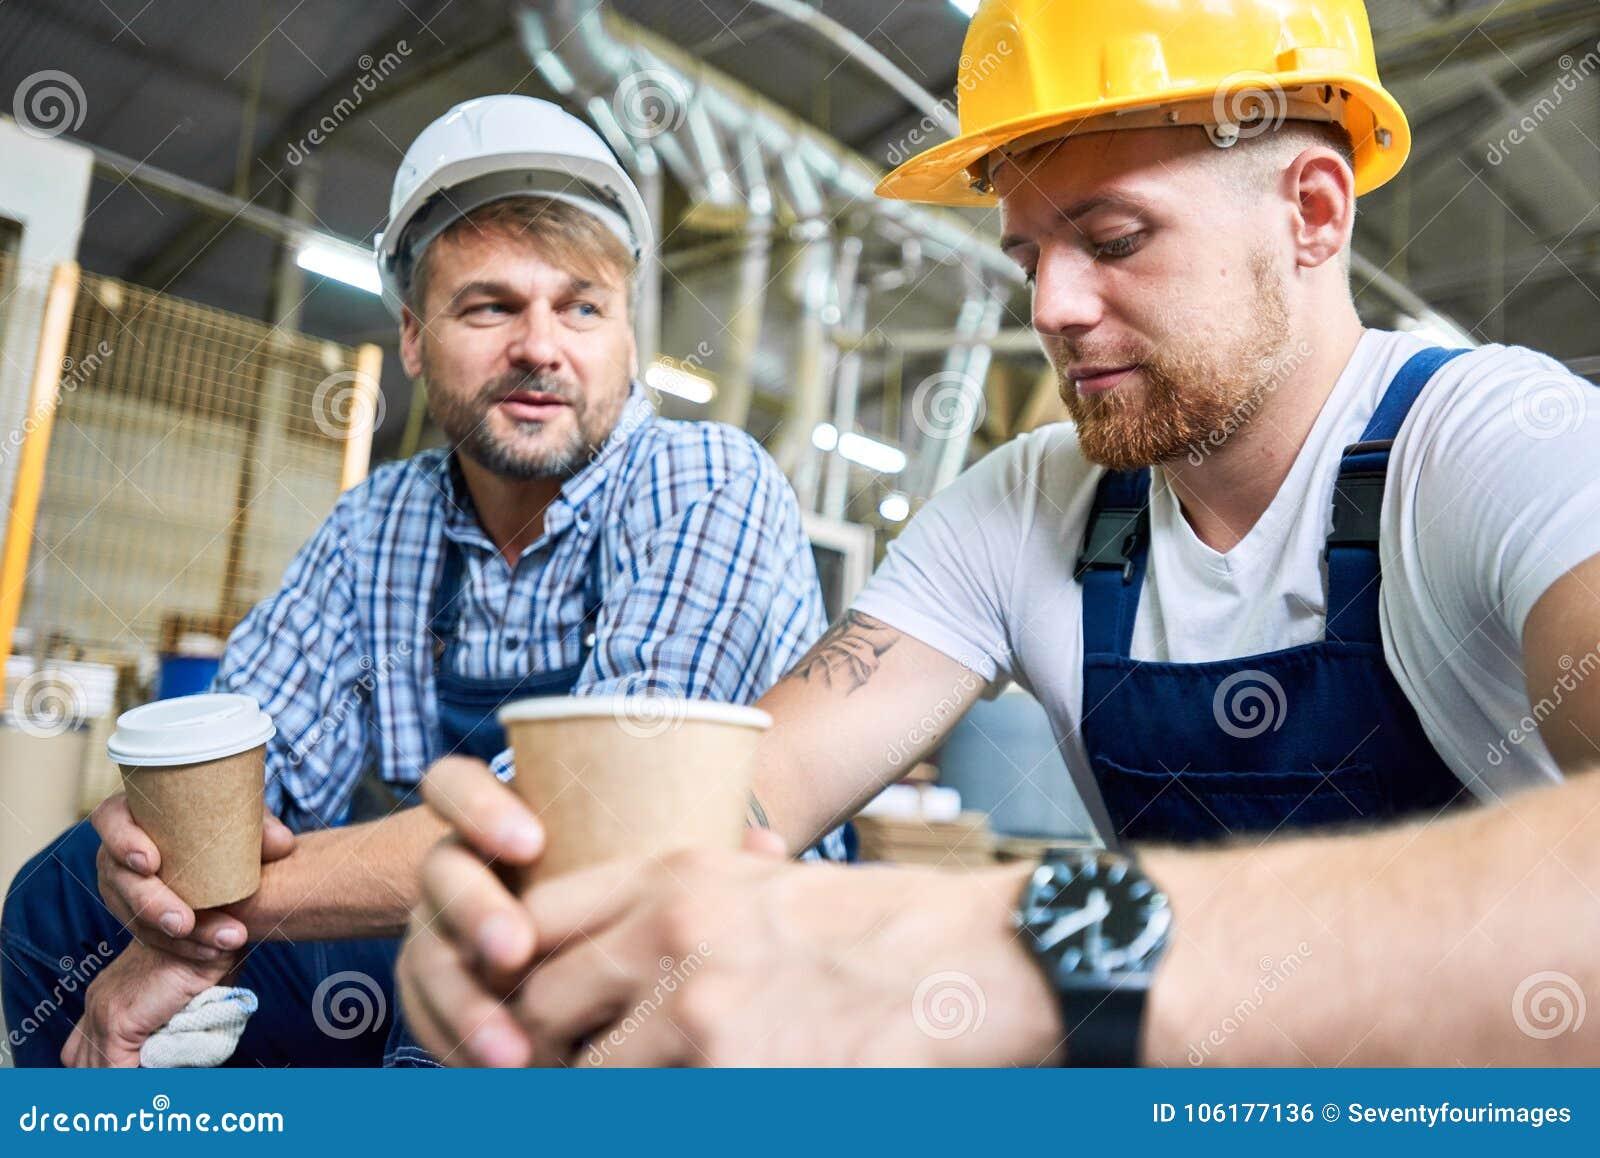 Take Break Coffeebreak : Builders on coffee break stock photo image of workman